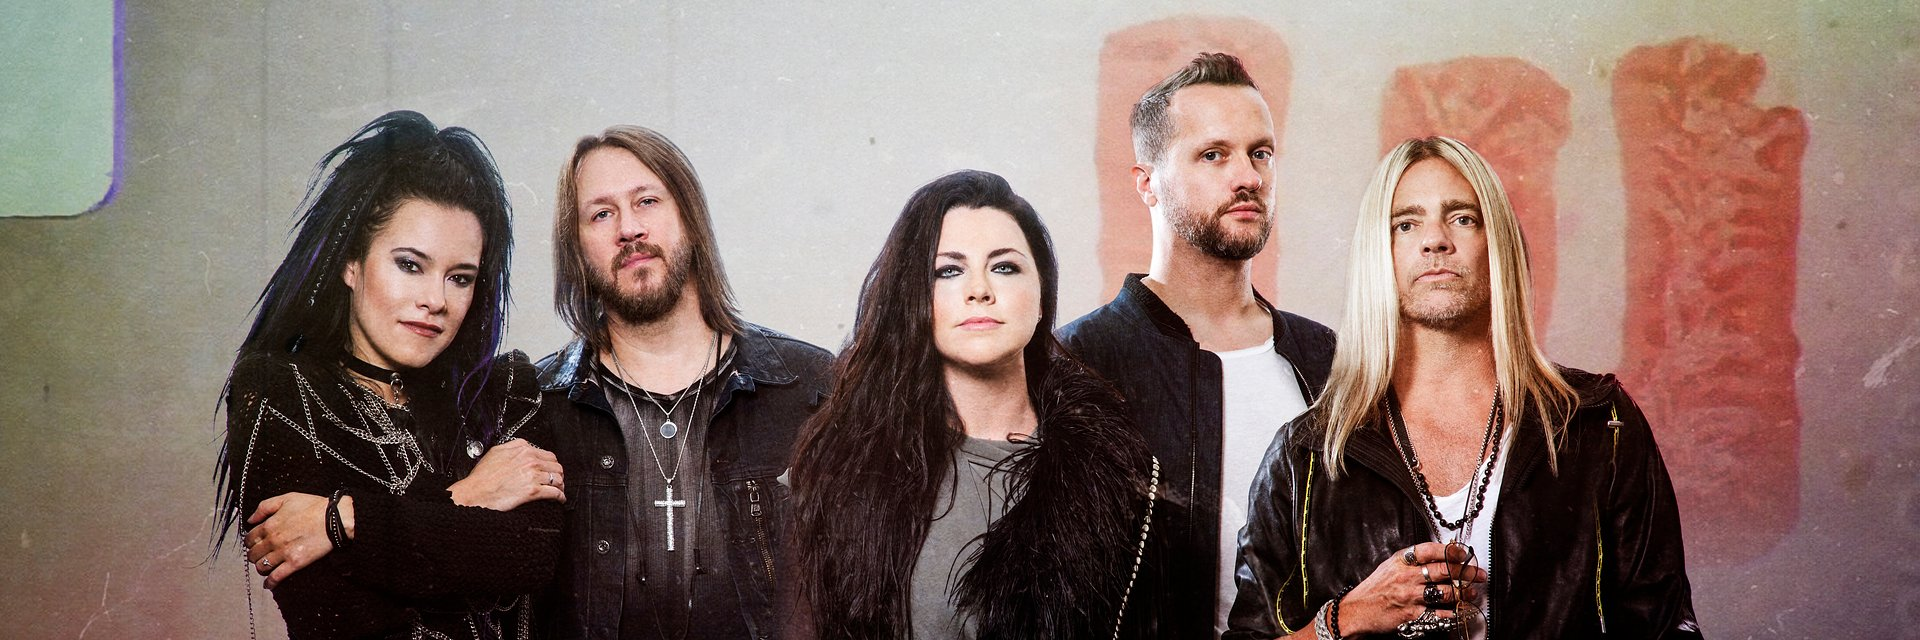 Evanescence zaprasza na koncert online!